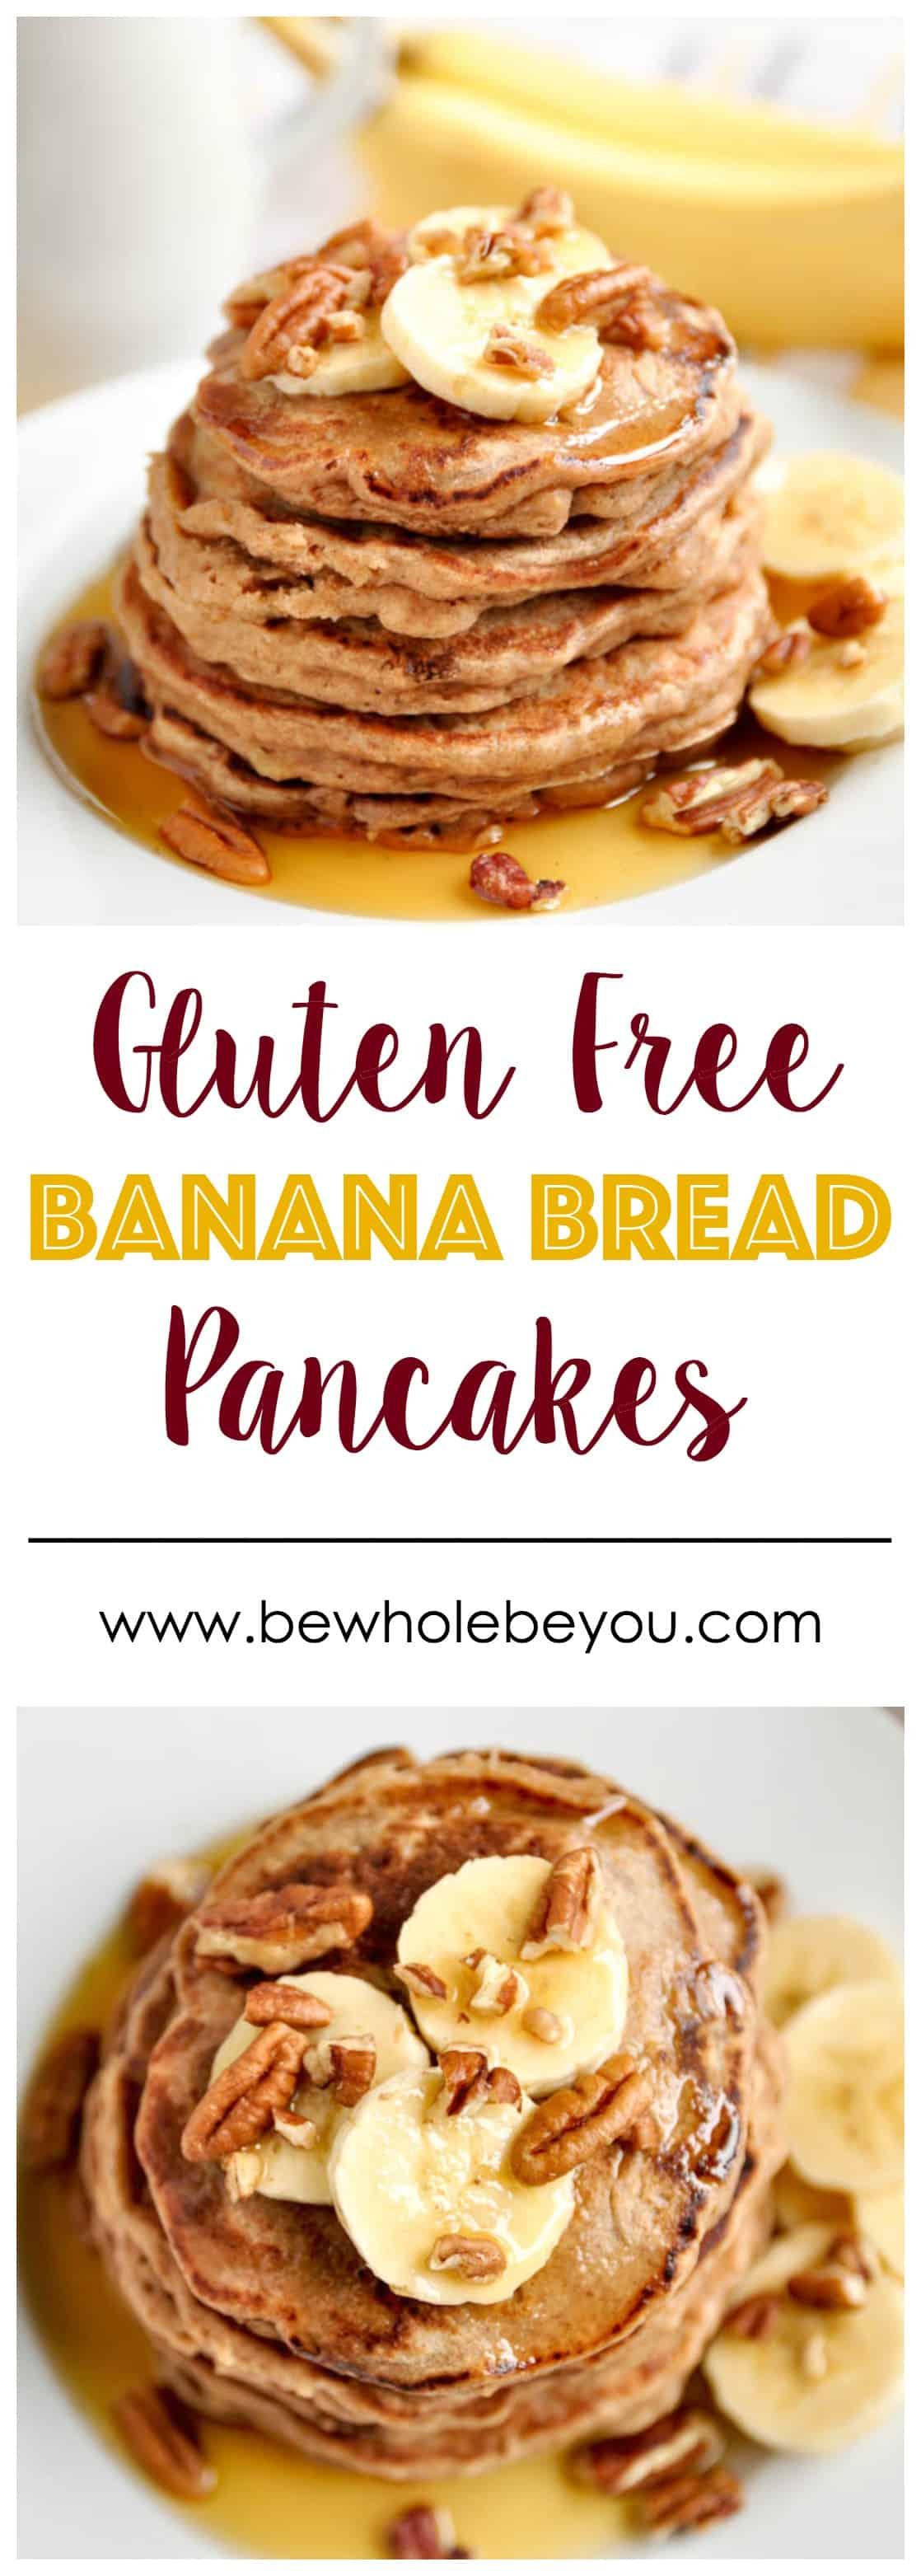 Gluten Free Banana Bread Pancakes.